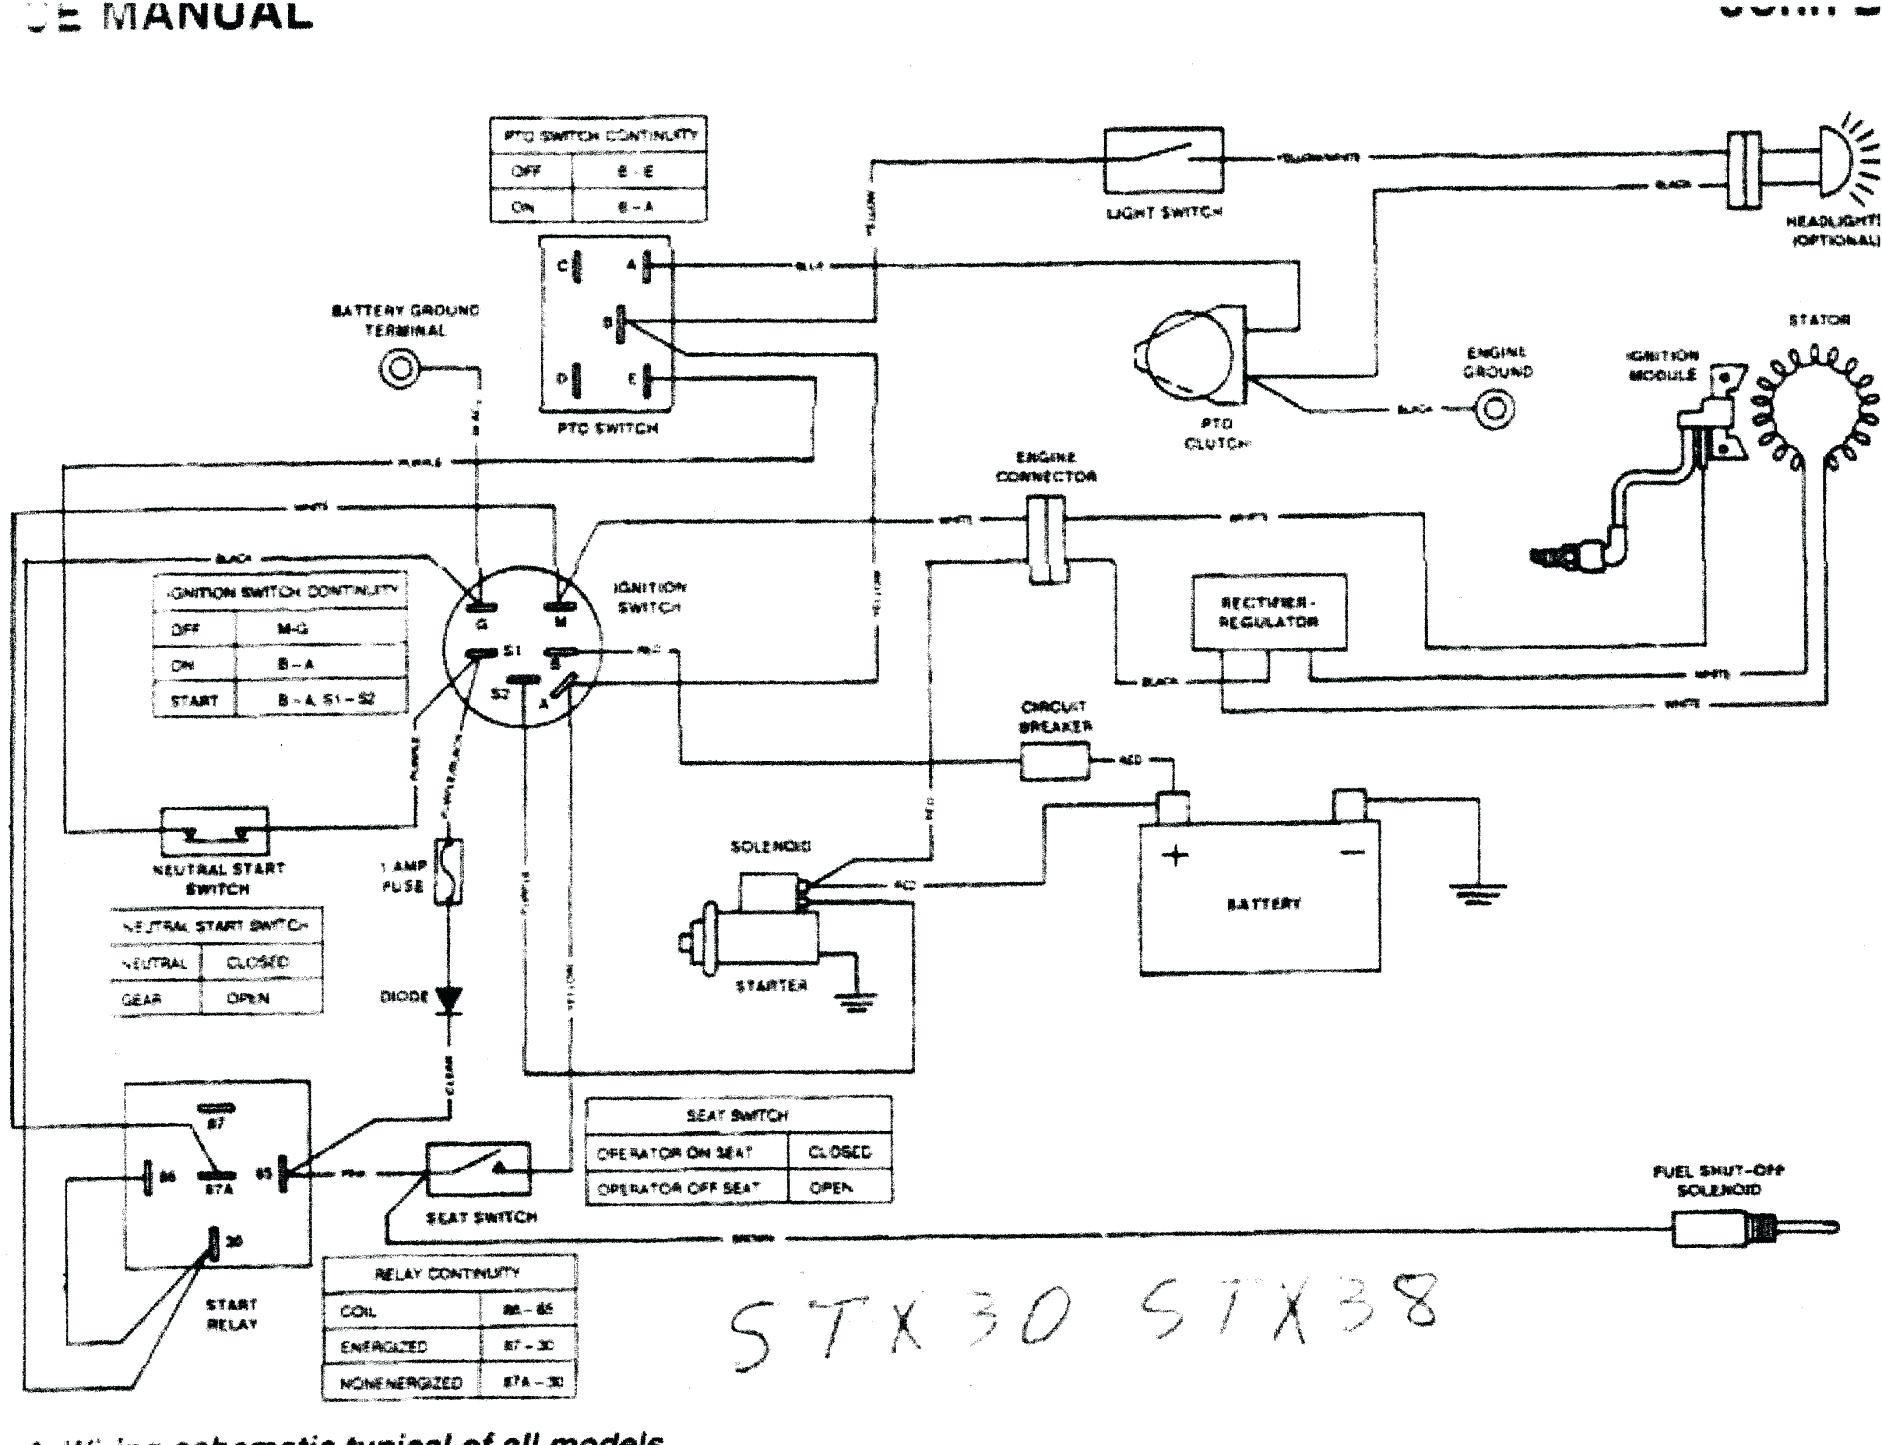 John Deere Wiring Diagrams Stx38 Diagram Free